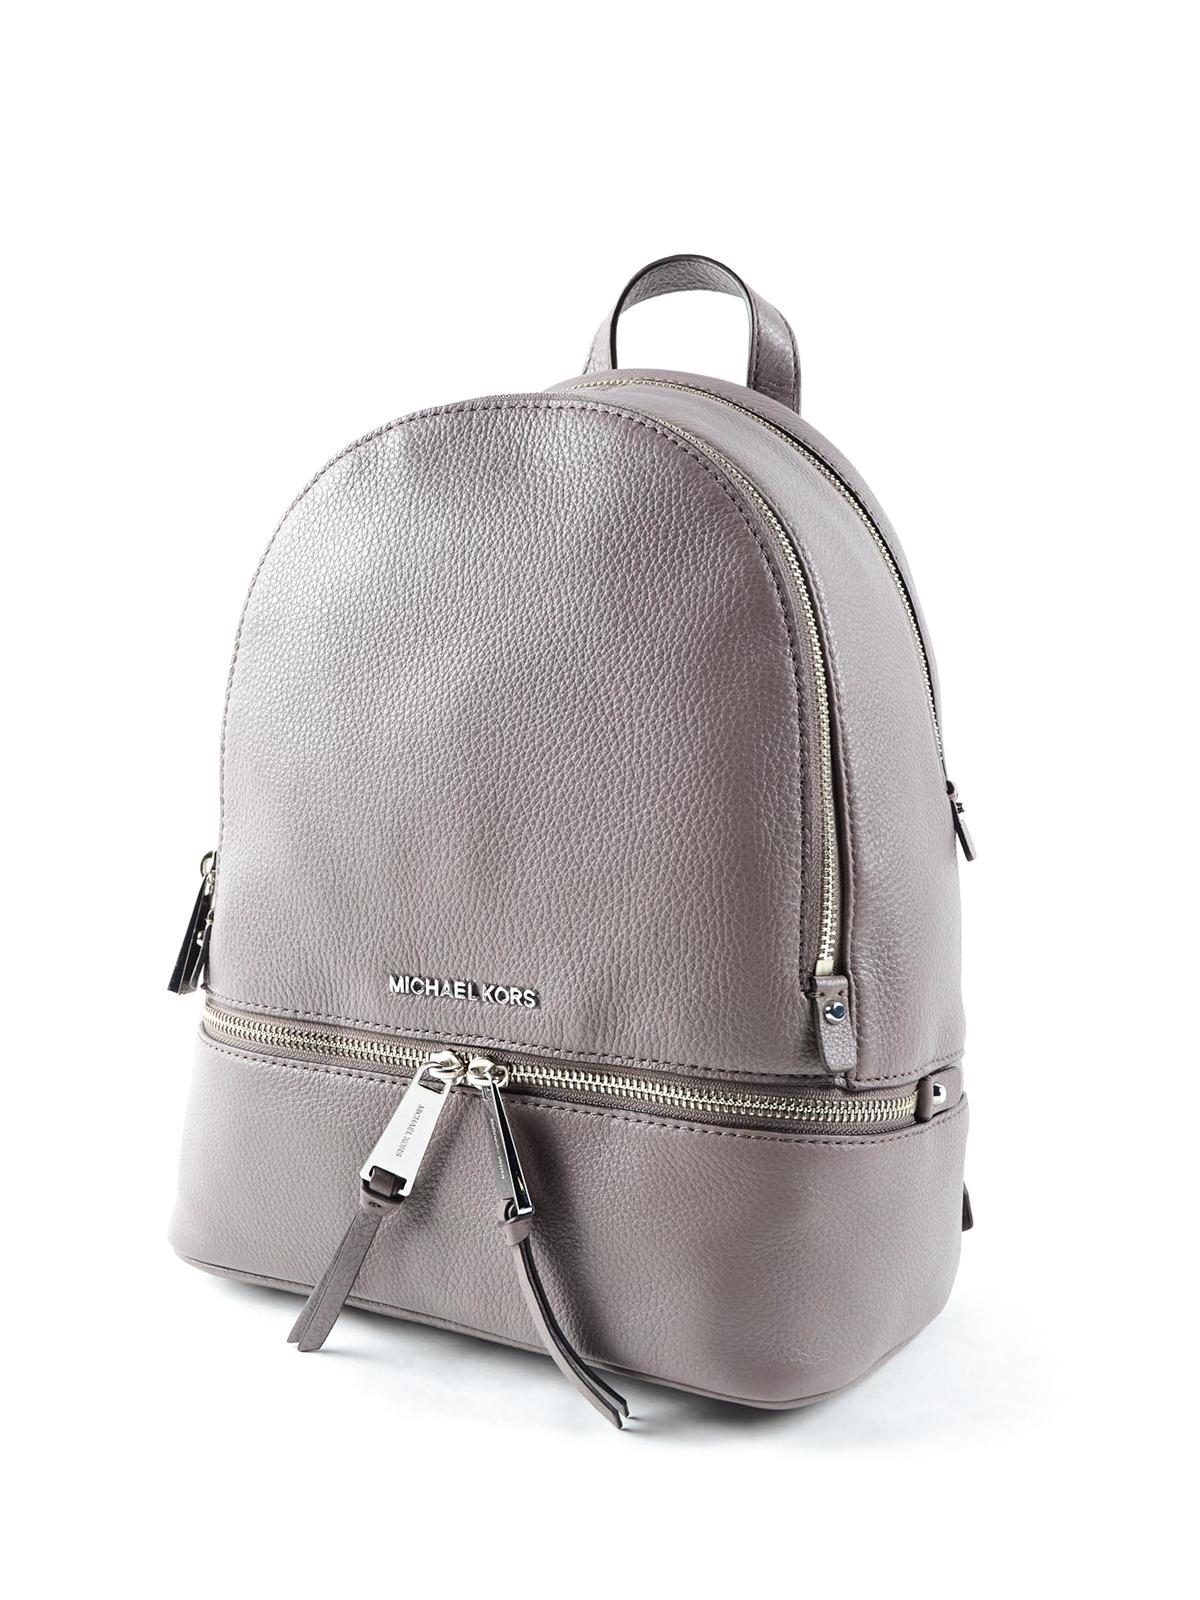 03322d98d1c0 Michael Kors - Rhea medium backpack - backpacks - 30S5SEZB1L 513